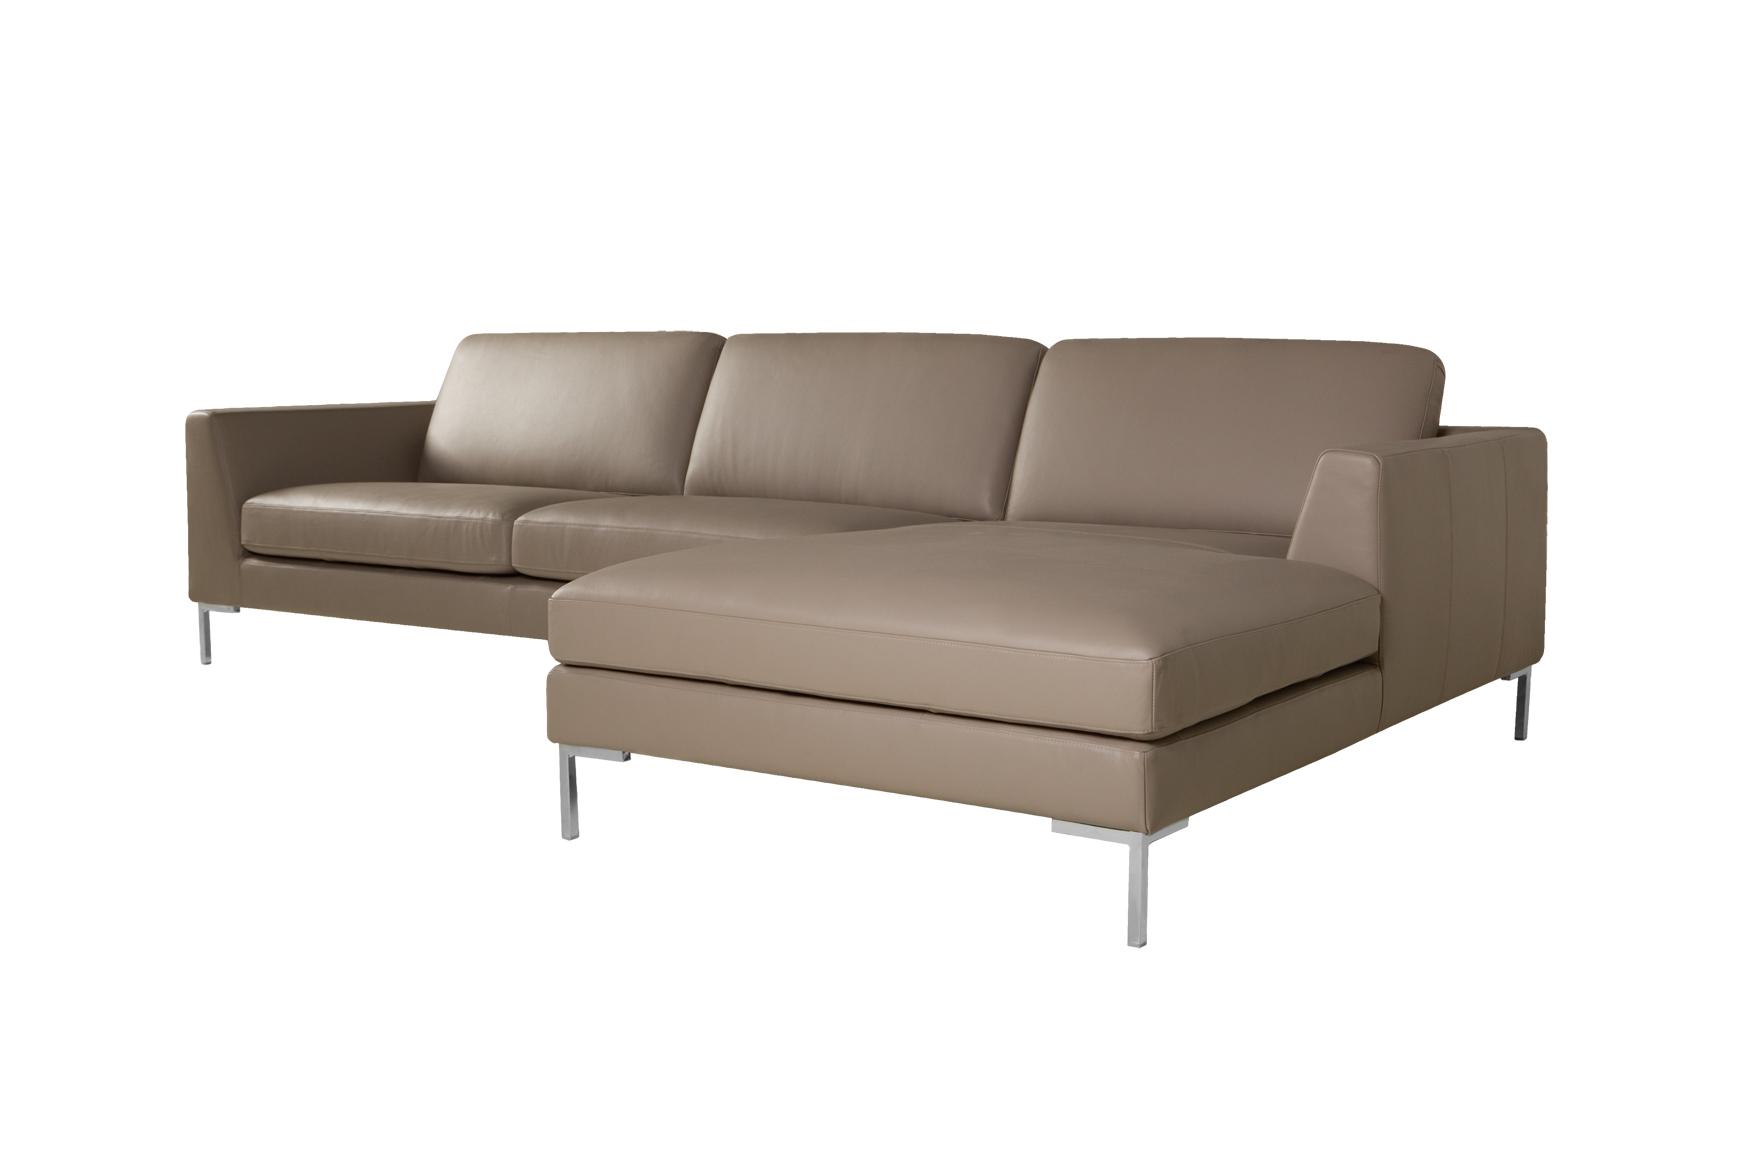 Allegra Set 1 Sofa With Chaiselongue-33208